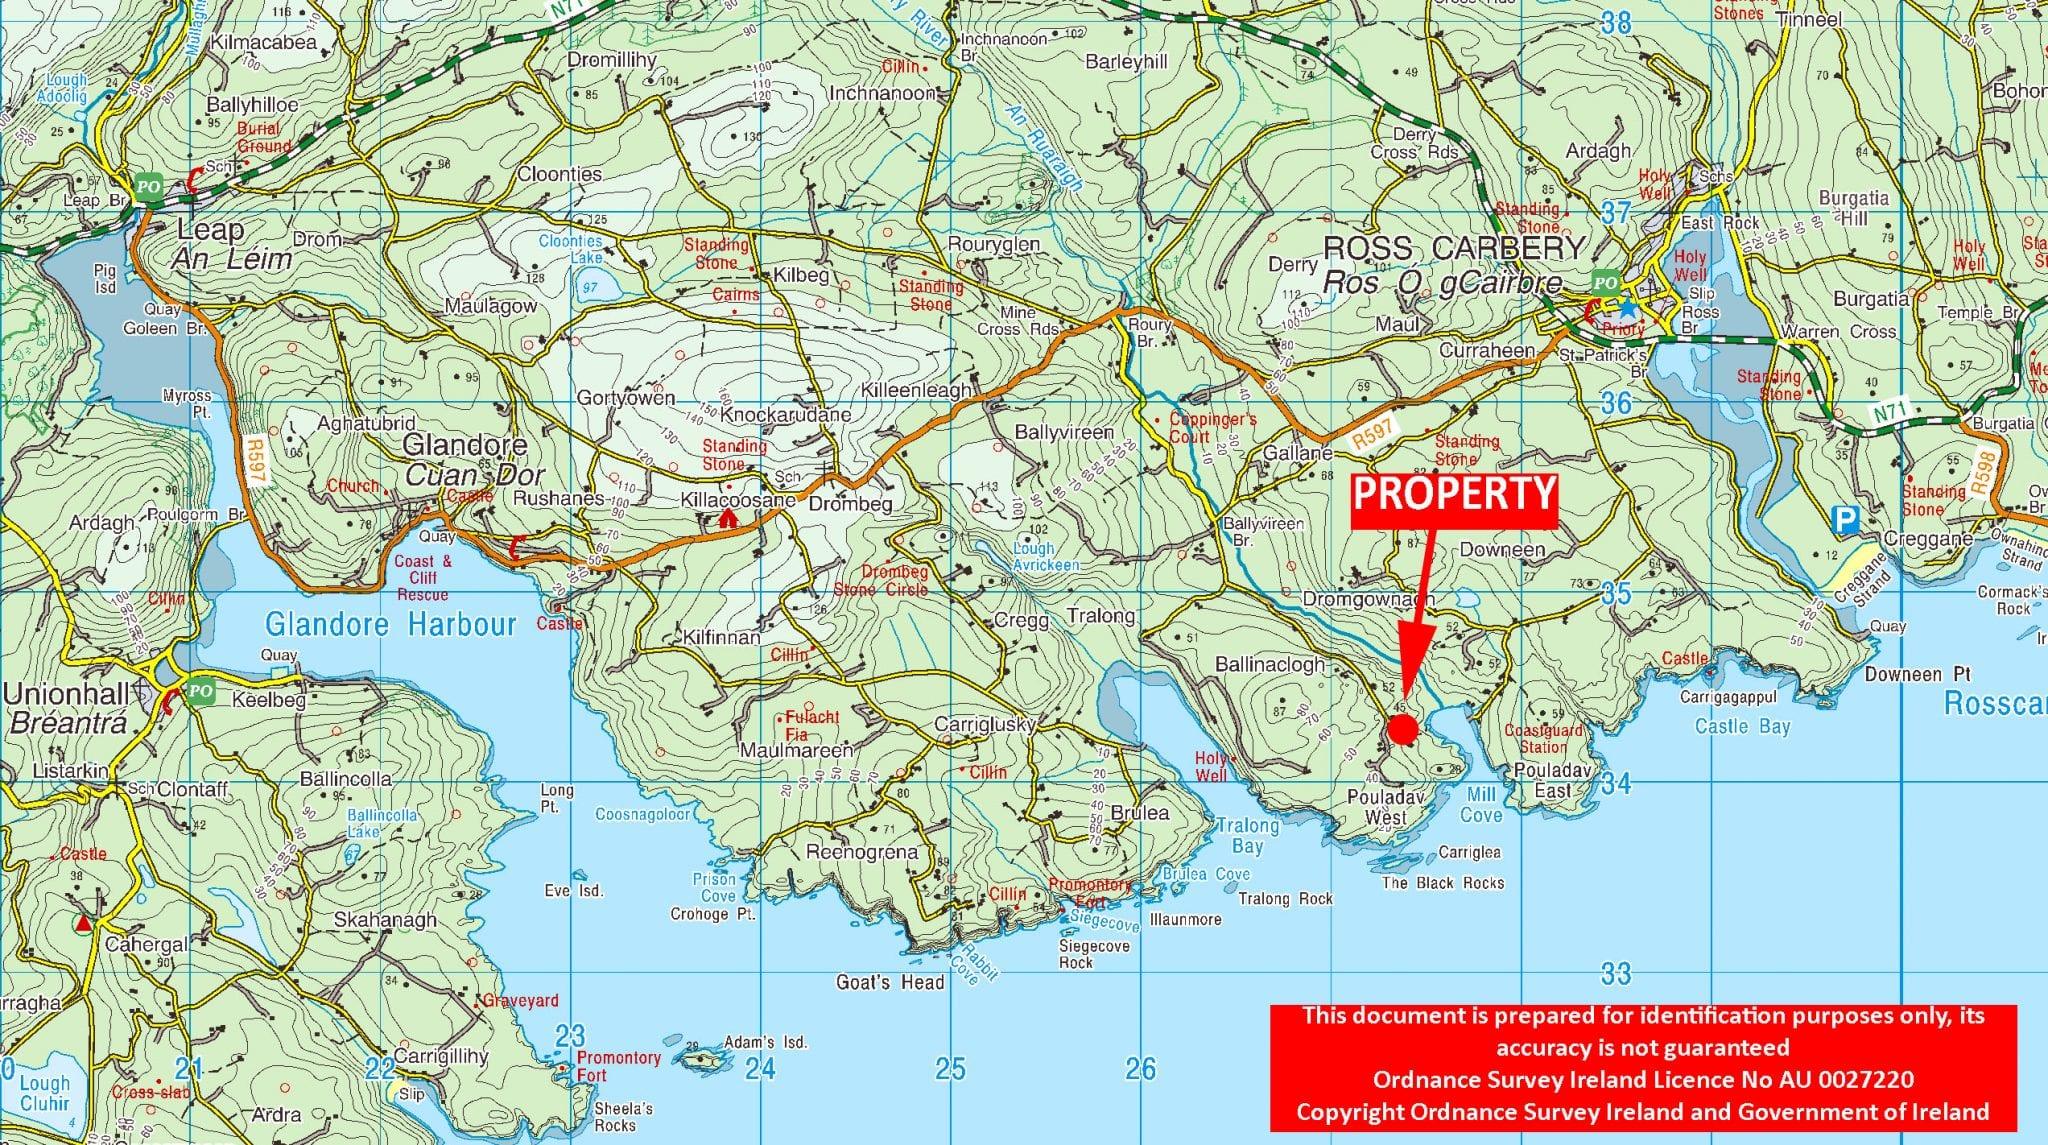 OS1202 LOCATION MAP